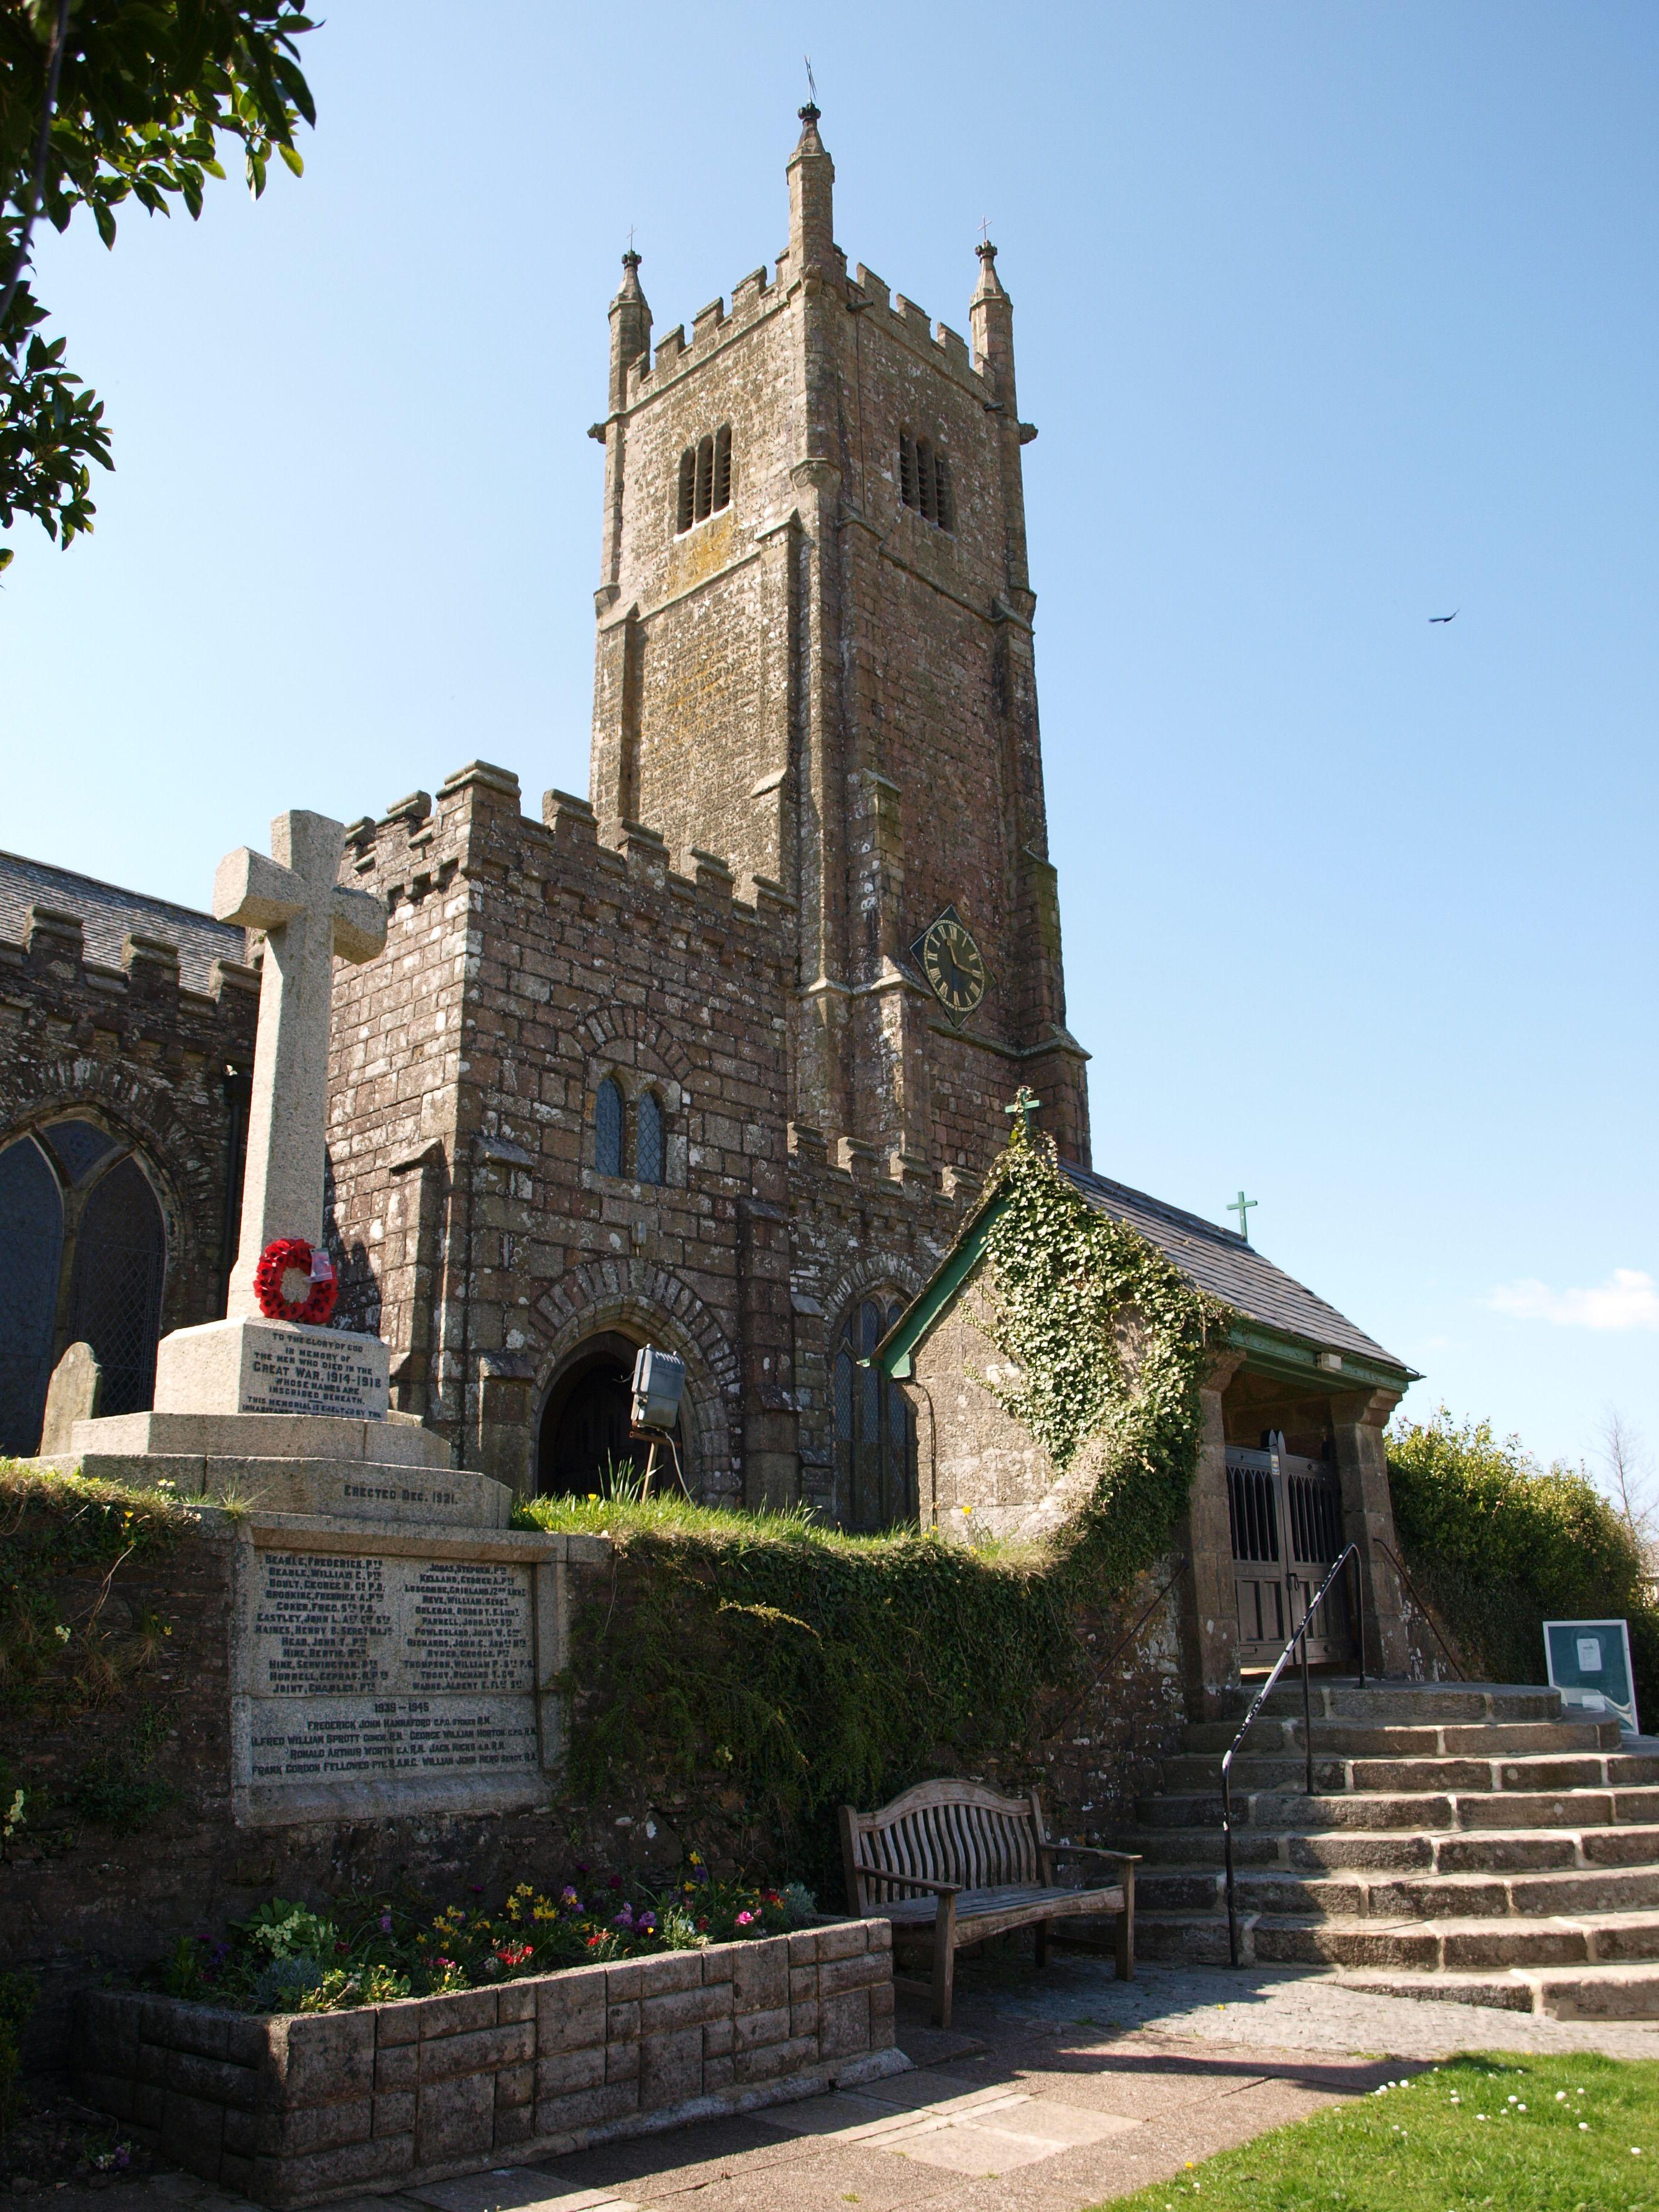 St Peters Church, Ugborough, South Devon. Churches and